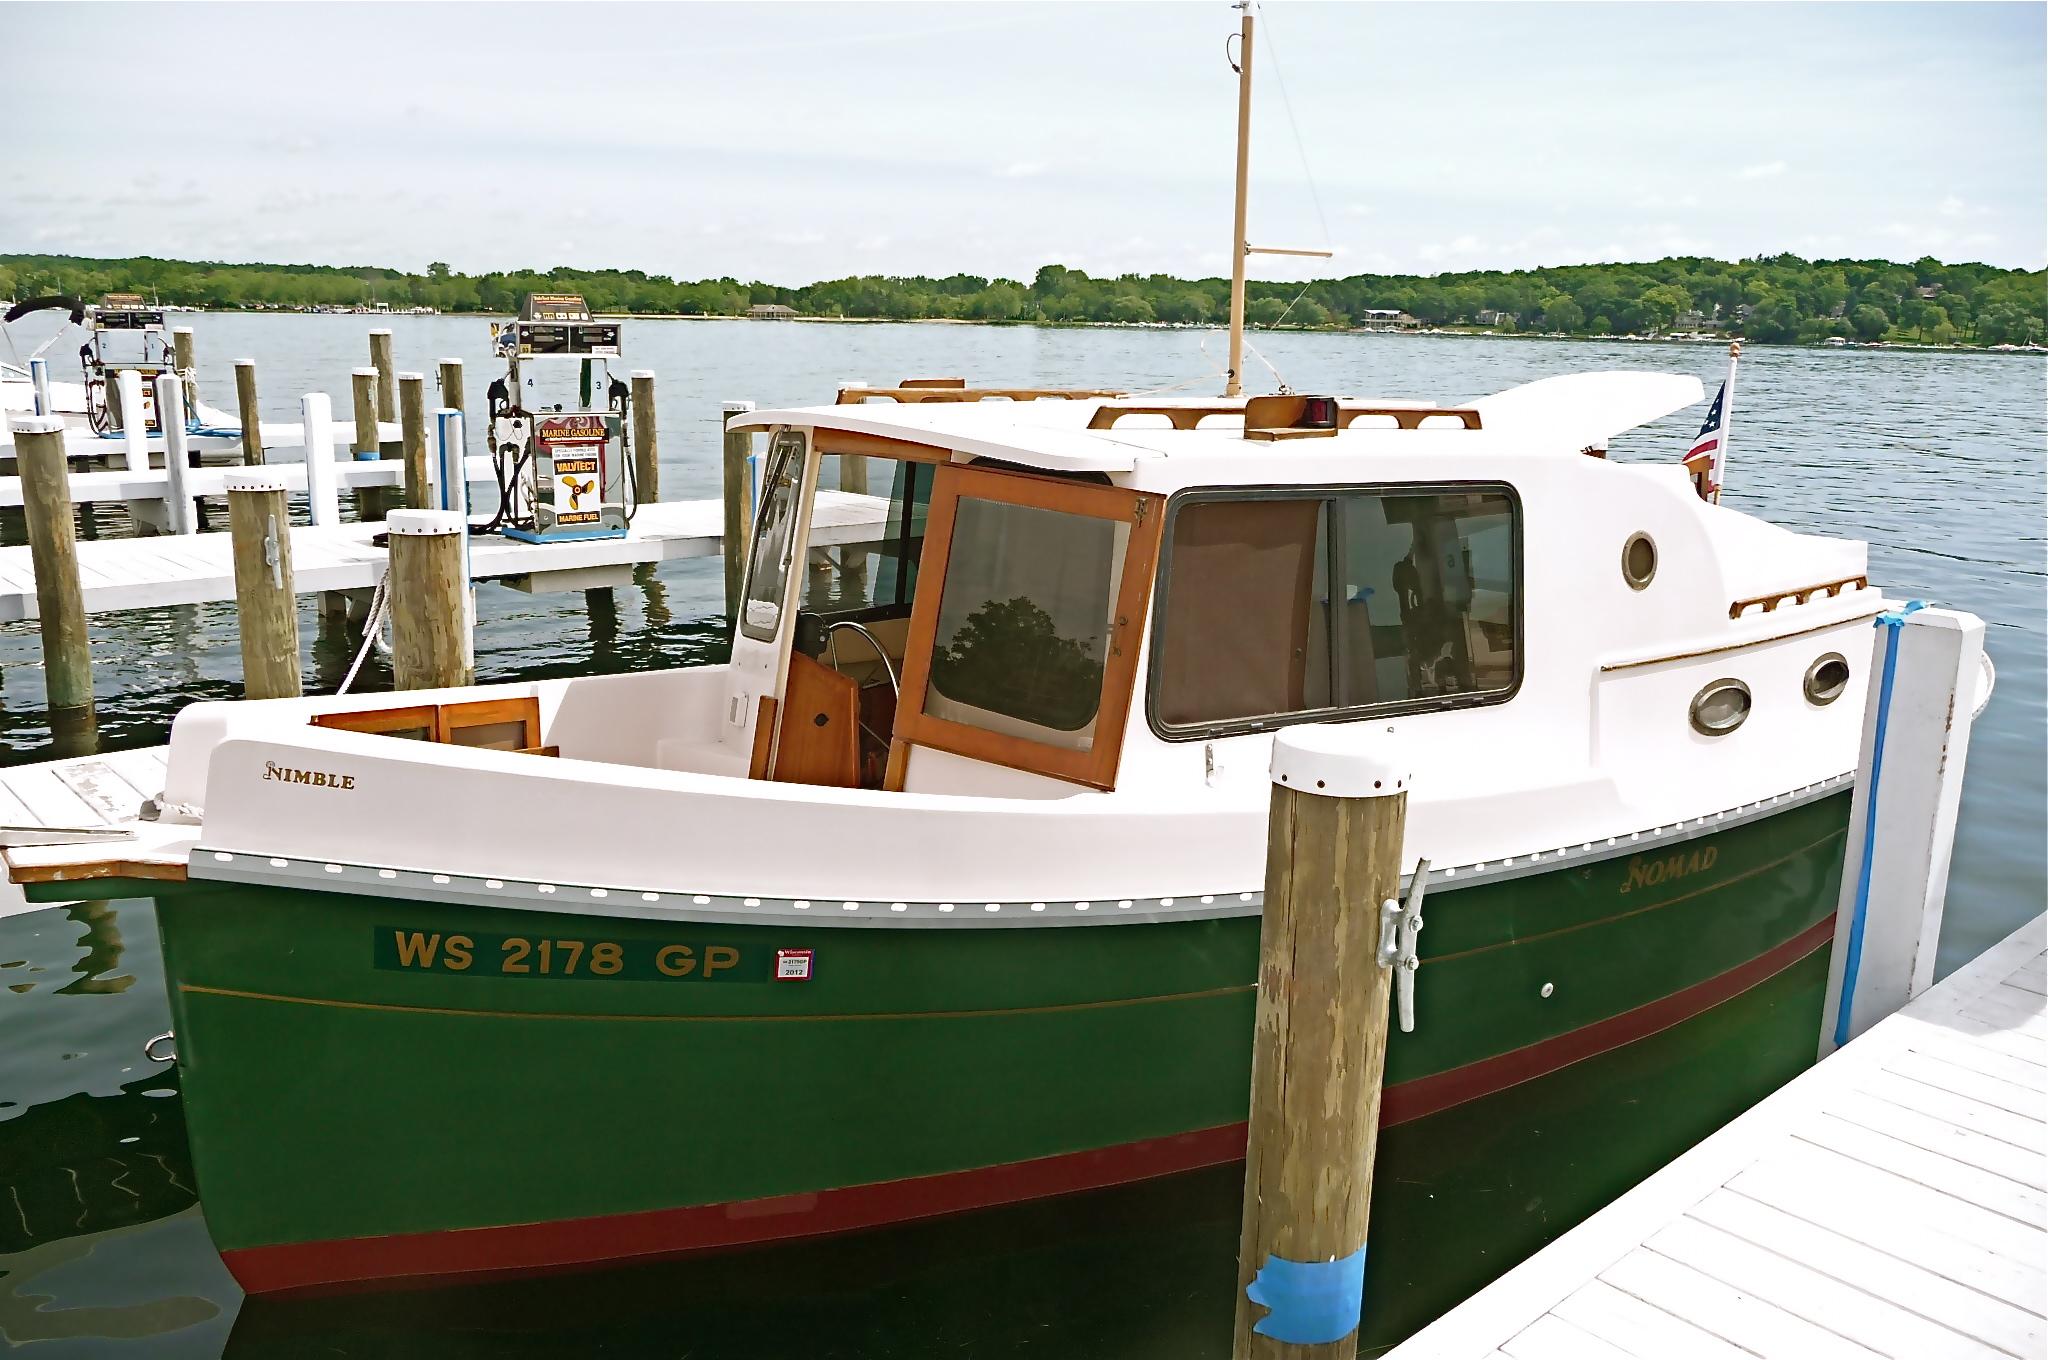 of the pocket trawler SeaBell, now for sale at Geneva Lake, WI ...: https://applewoody.wordpress.com/tag/pocket-trawler